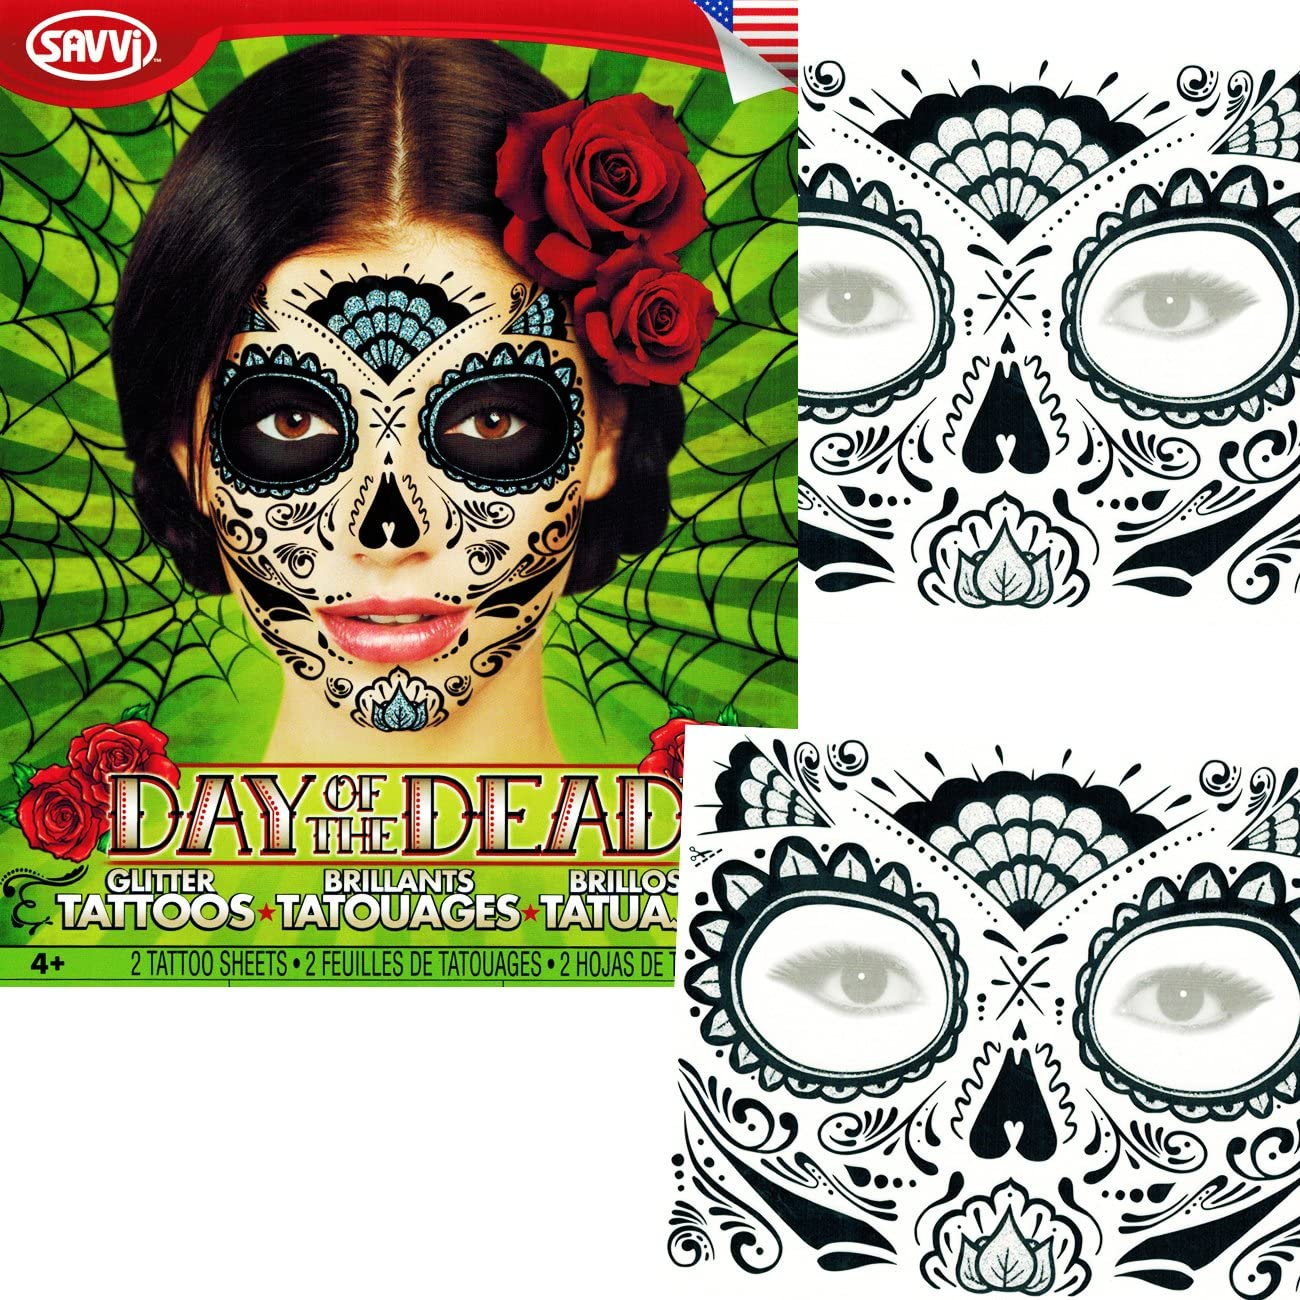 Sugar Skull Temporary Tattoos Costume Kit (Set of 2 Day of the Dead Tattoos, Glitter Web Design)